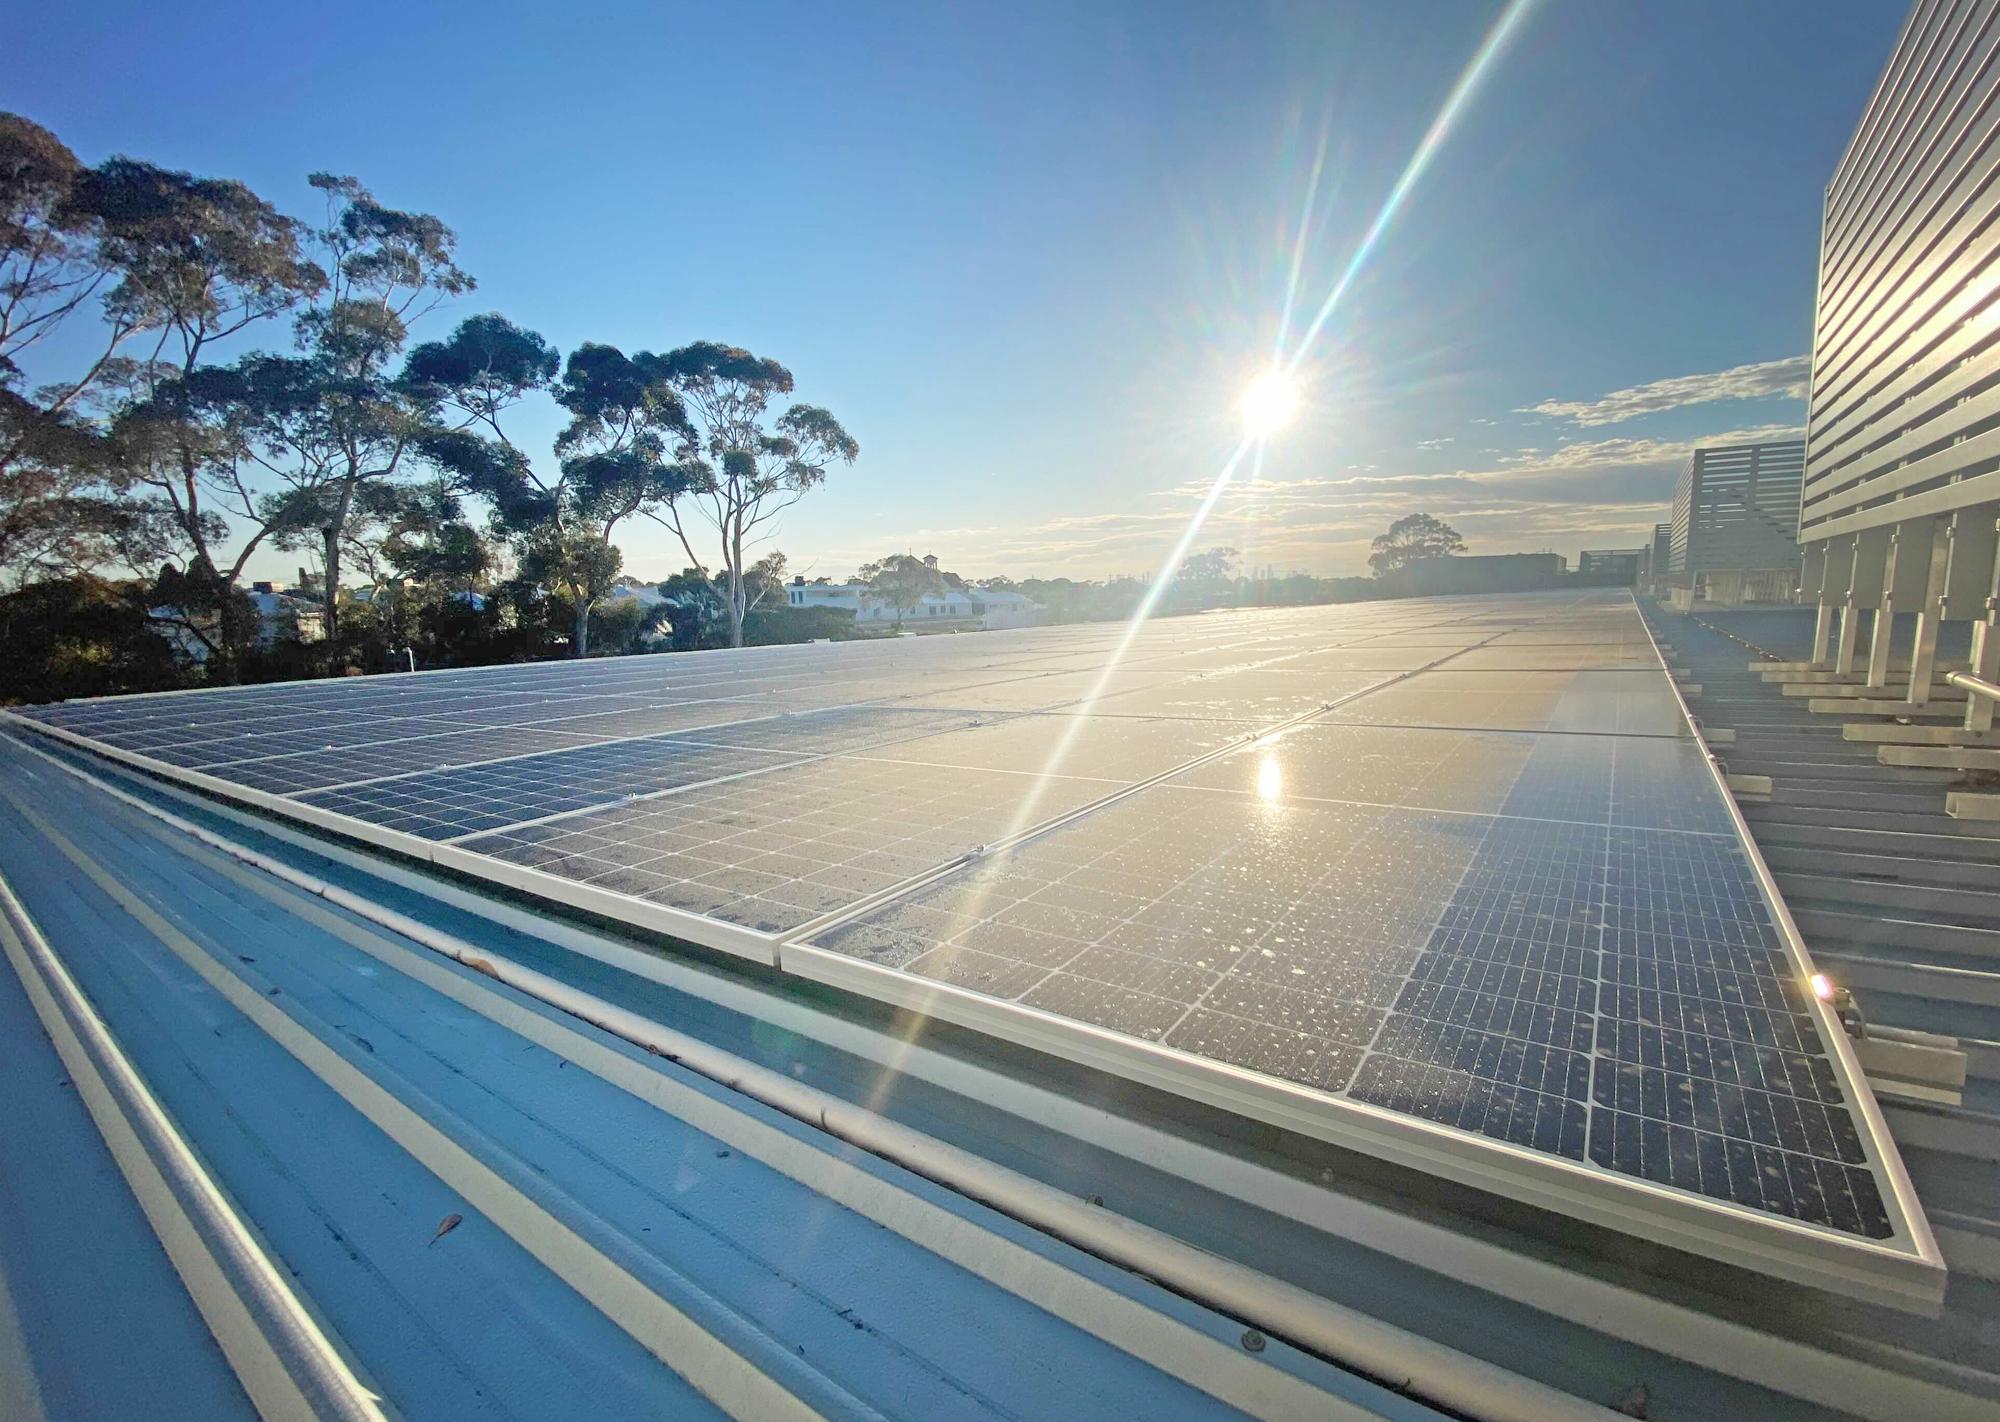 Commercial solar sales, unspoken concerns and USP's